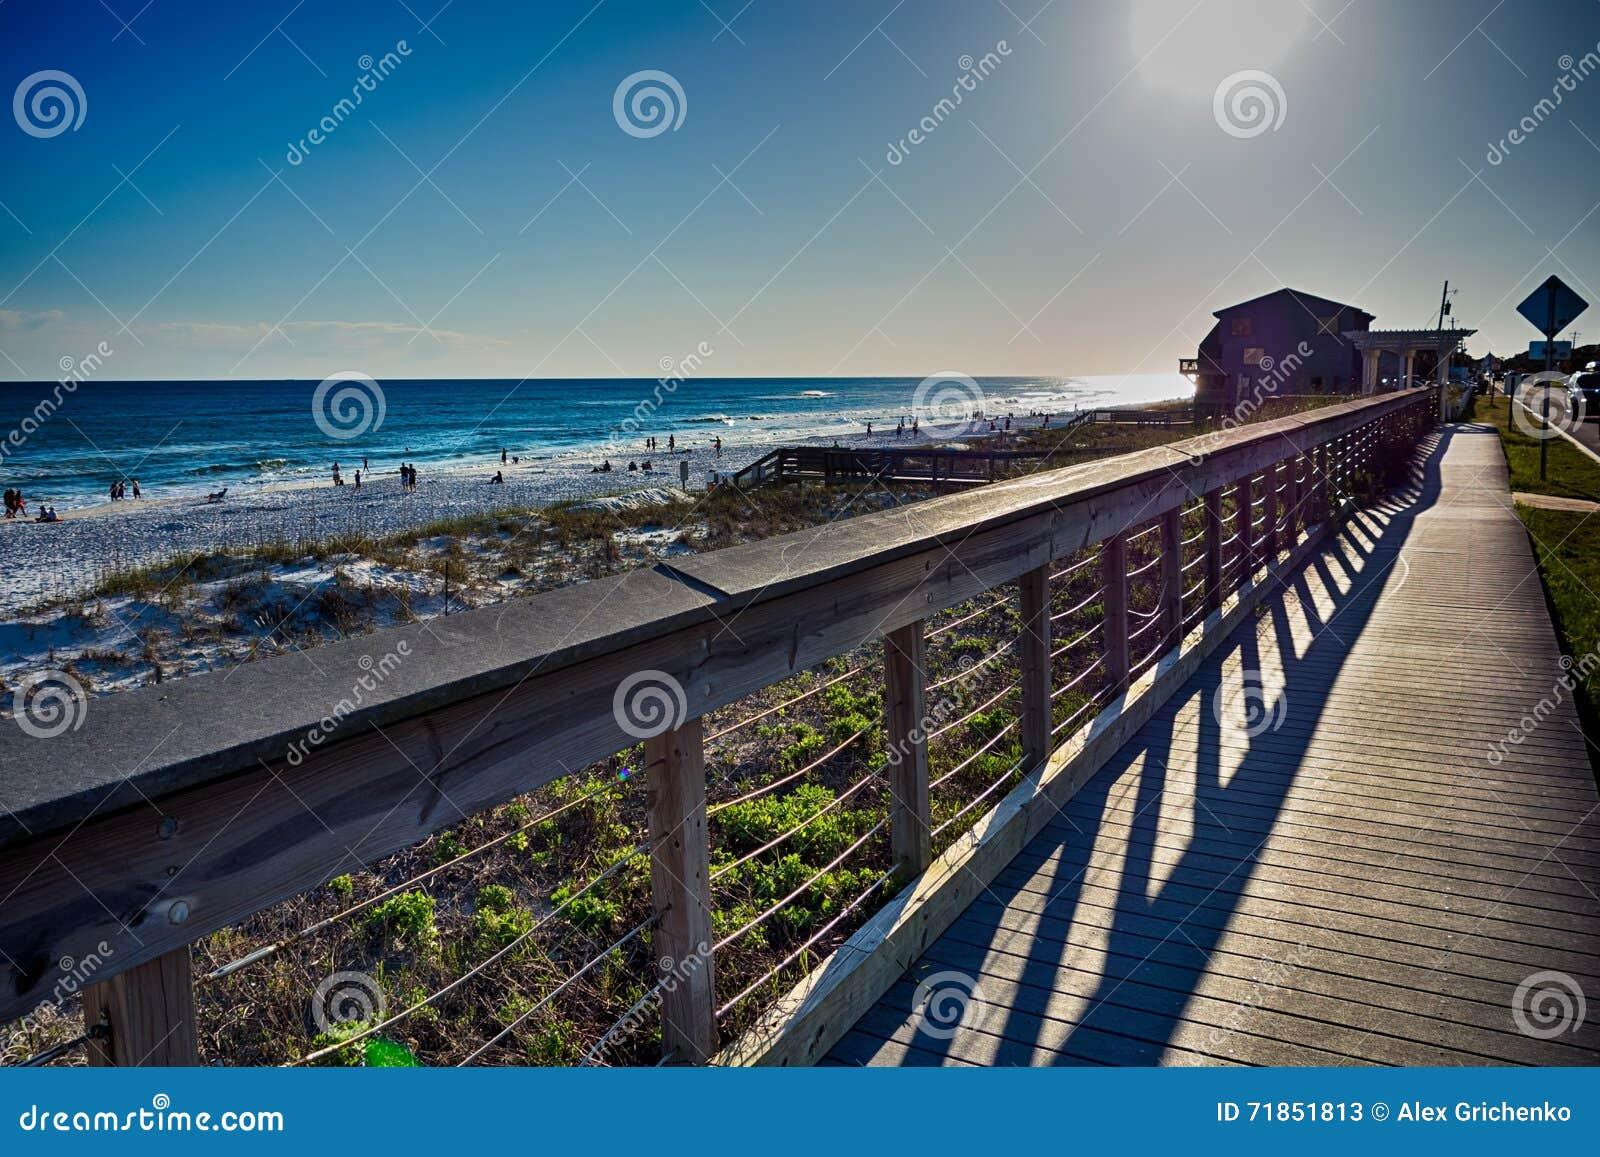 destin florida beach scenes stock image - image of boardwalk, cloud